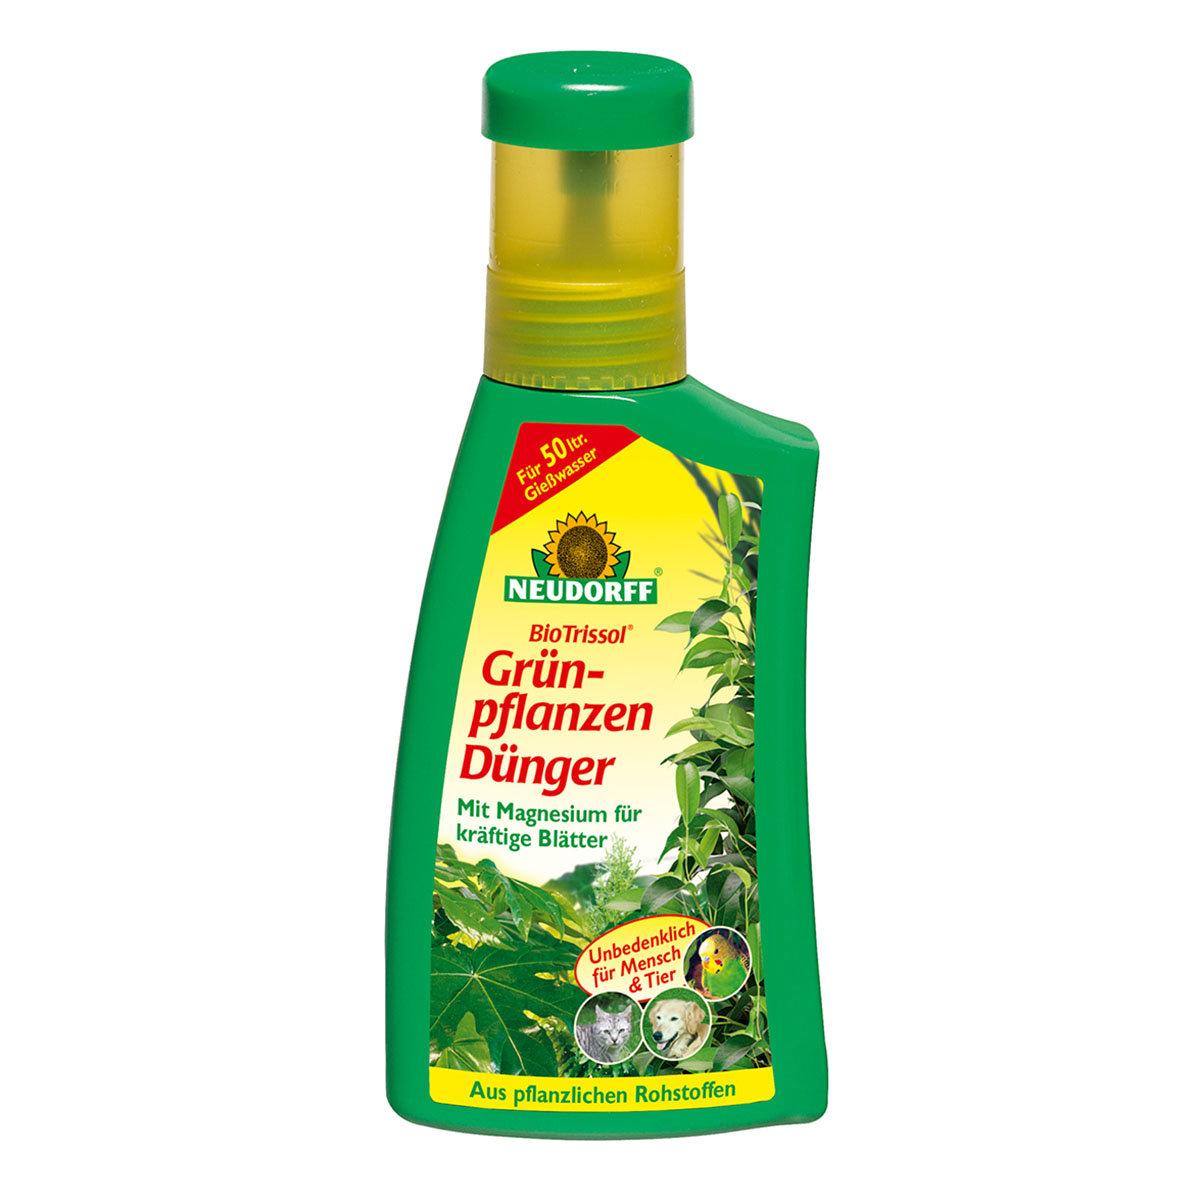 Neudorff BioTrissol GrünpflanzenDünger, 250 ml